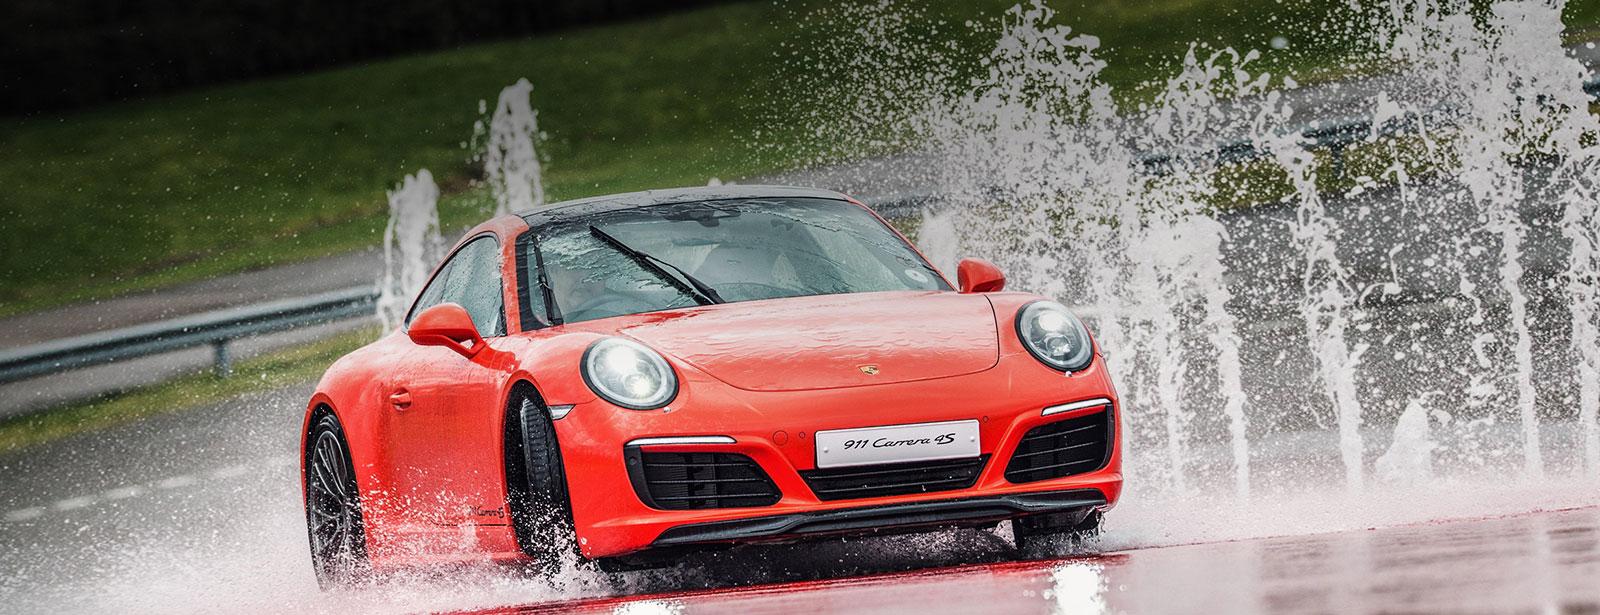 Porsche 911 Driving Experience Courses Driving